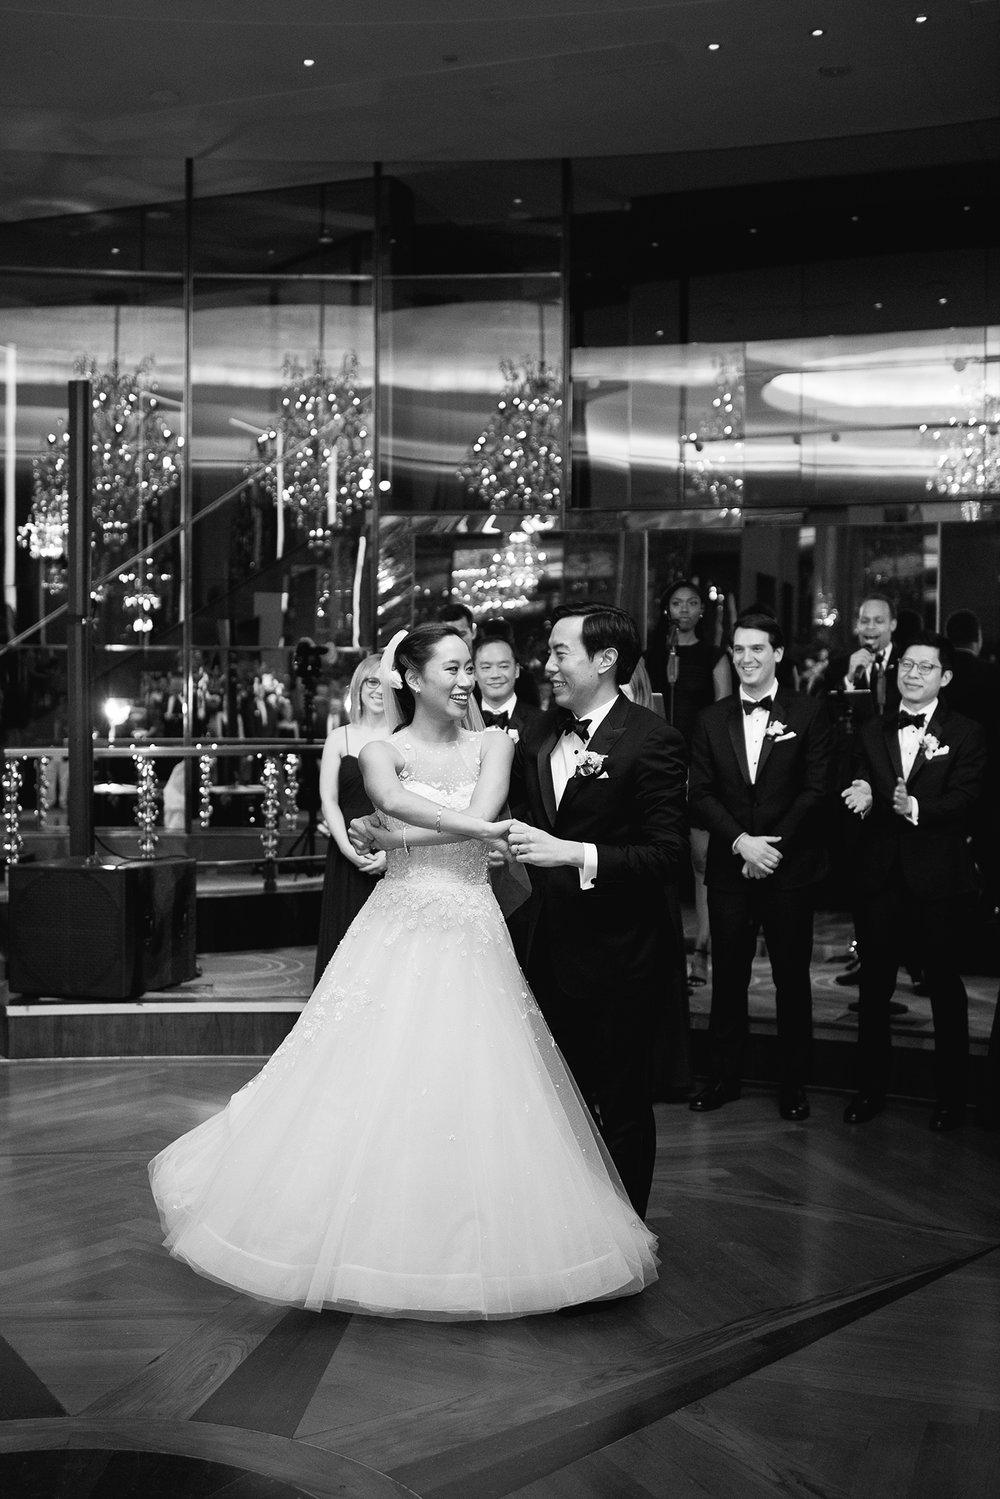 Fourteen-Forty-BrklynViewPhotography-JoveMeyer-NewYork-Wedding-16.JPG